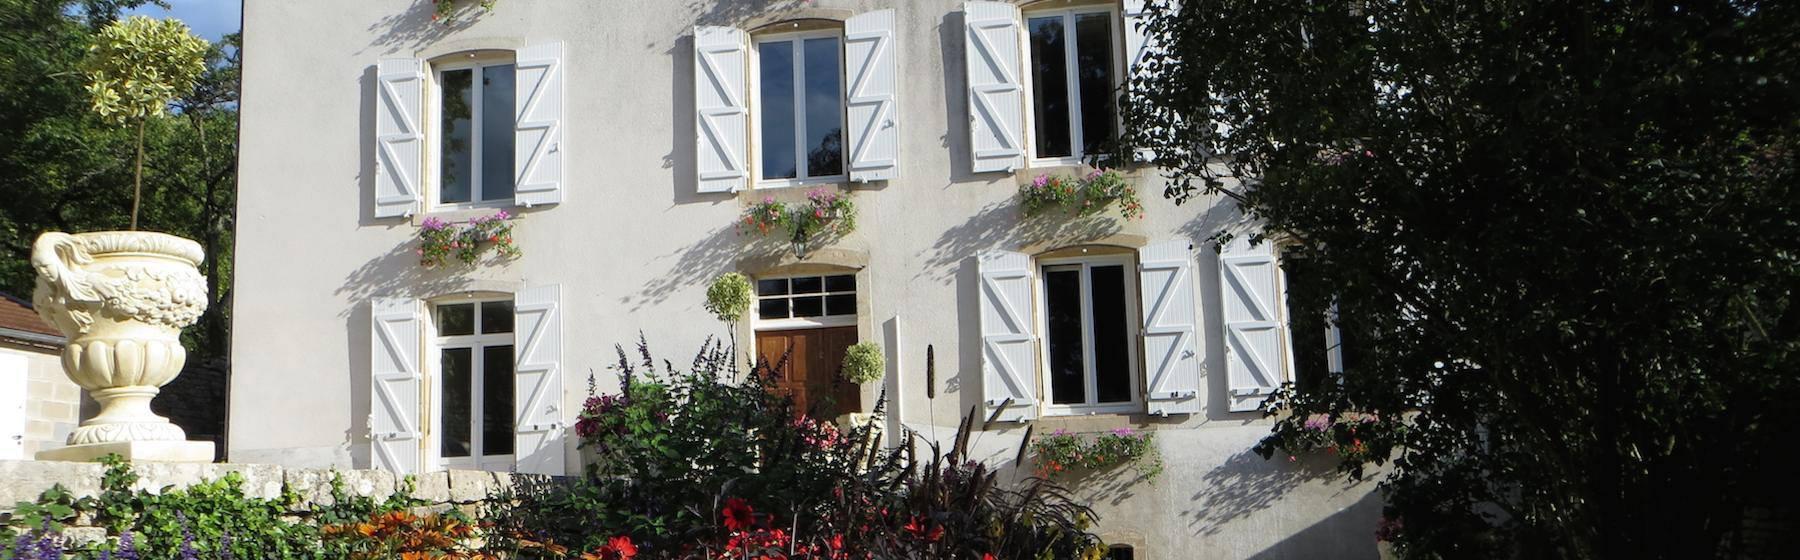 Langres and Dijon